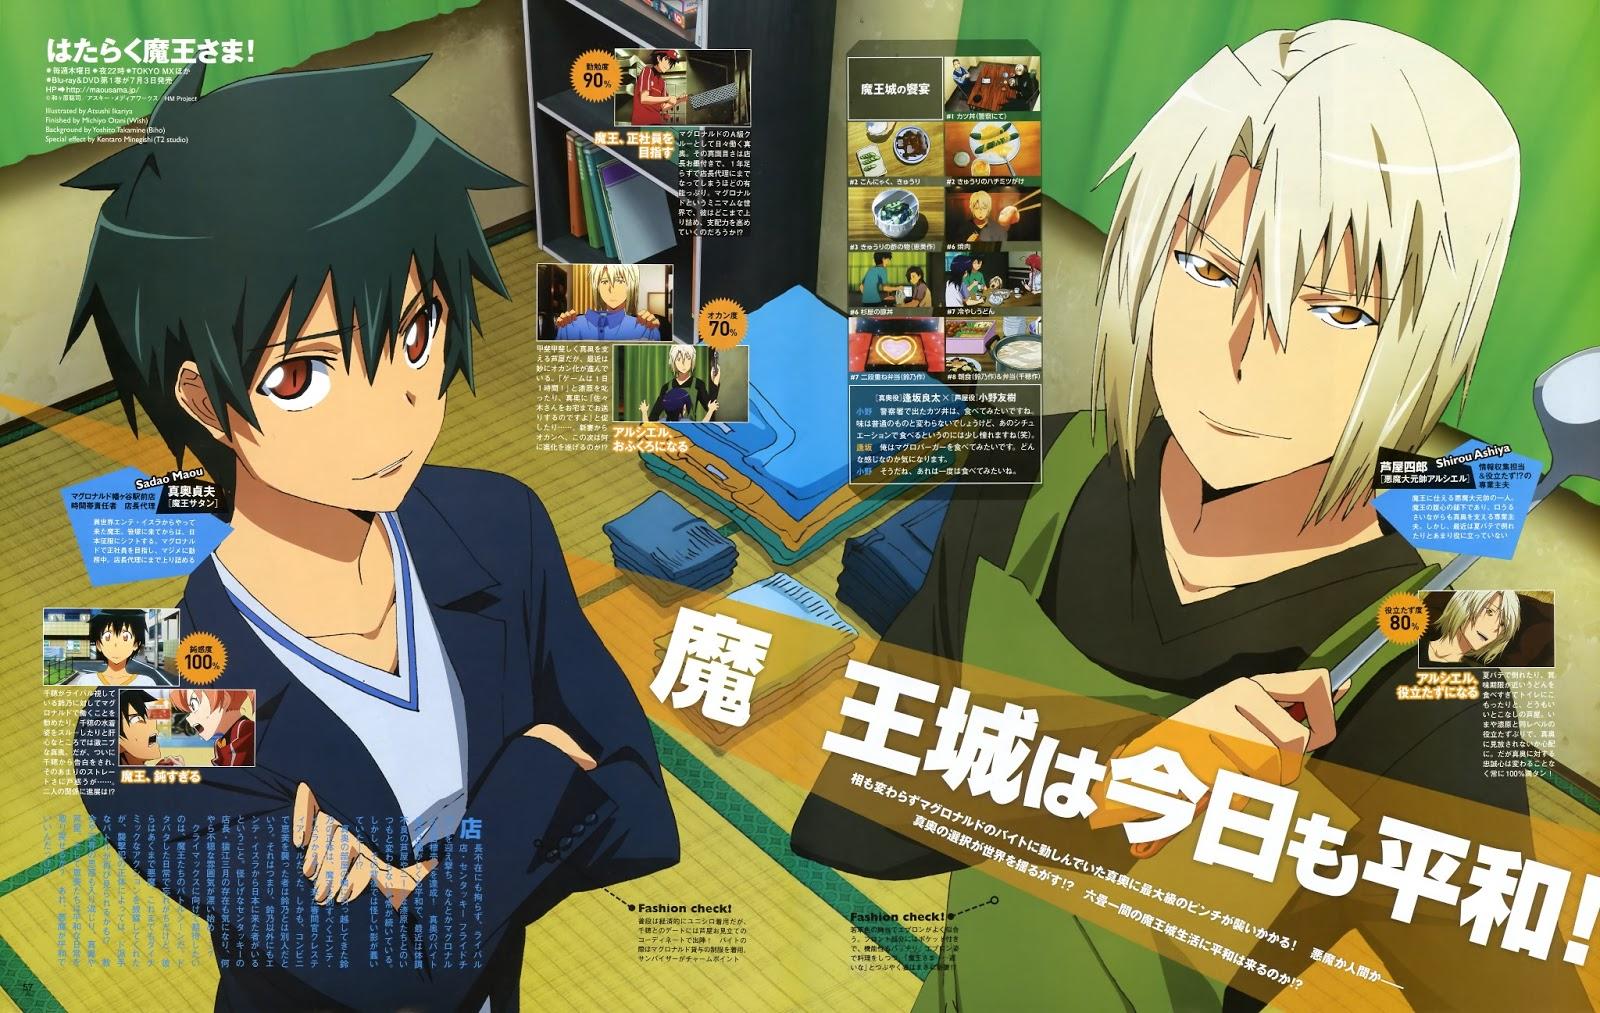 hataraku maou-sama volume 6 pdf